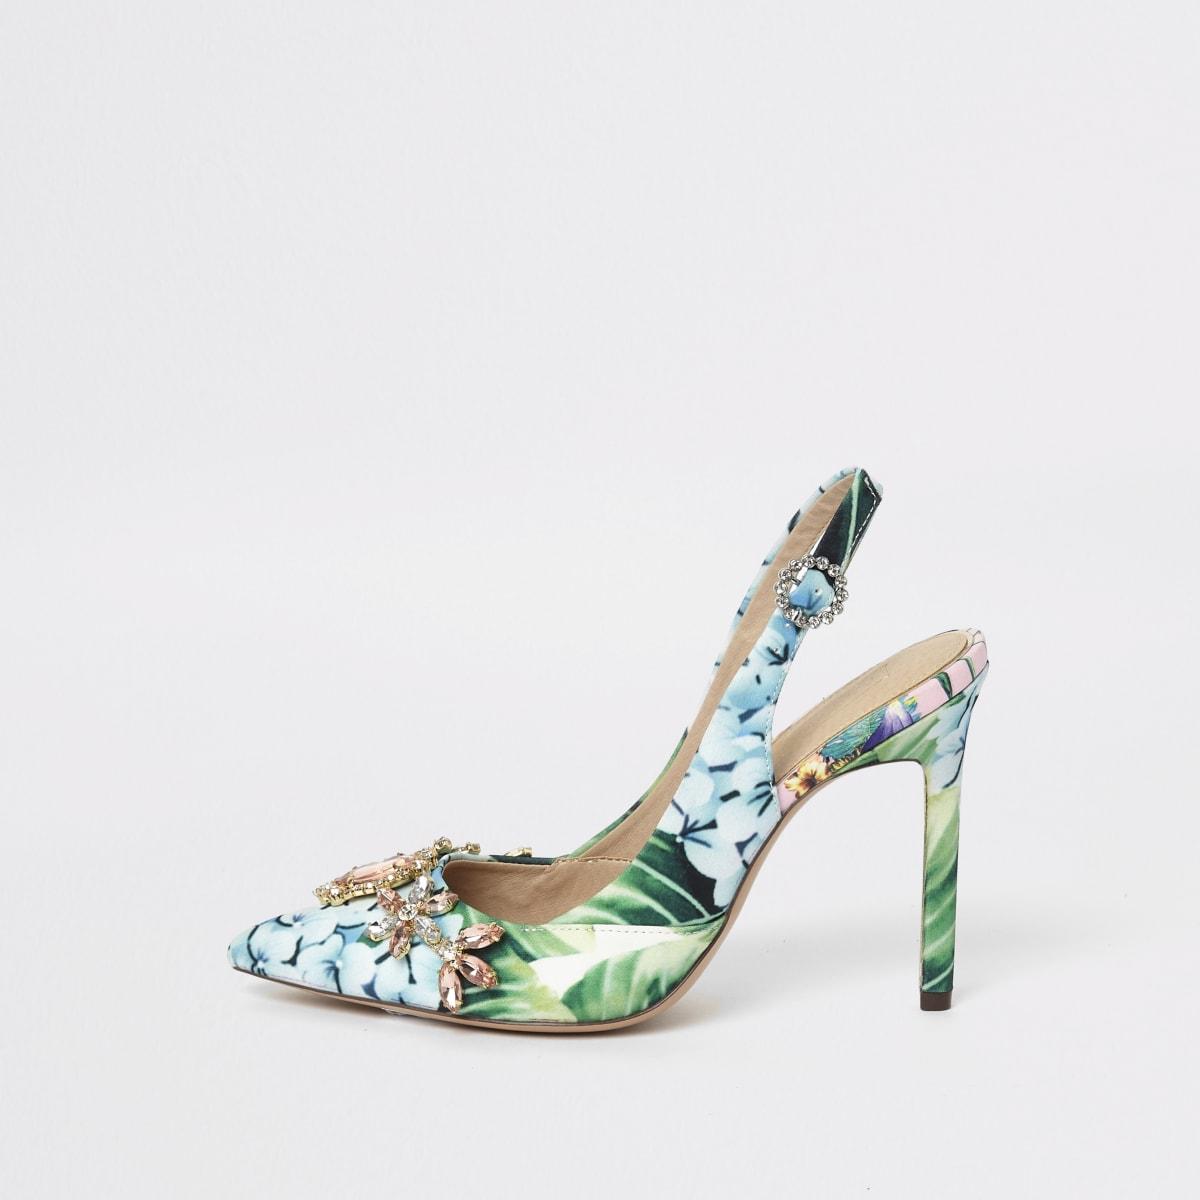 Green floral slingback pumps